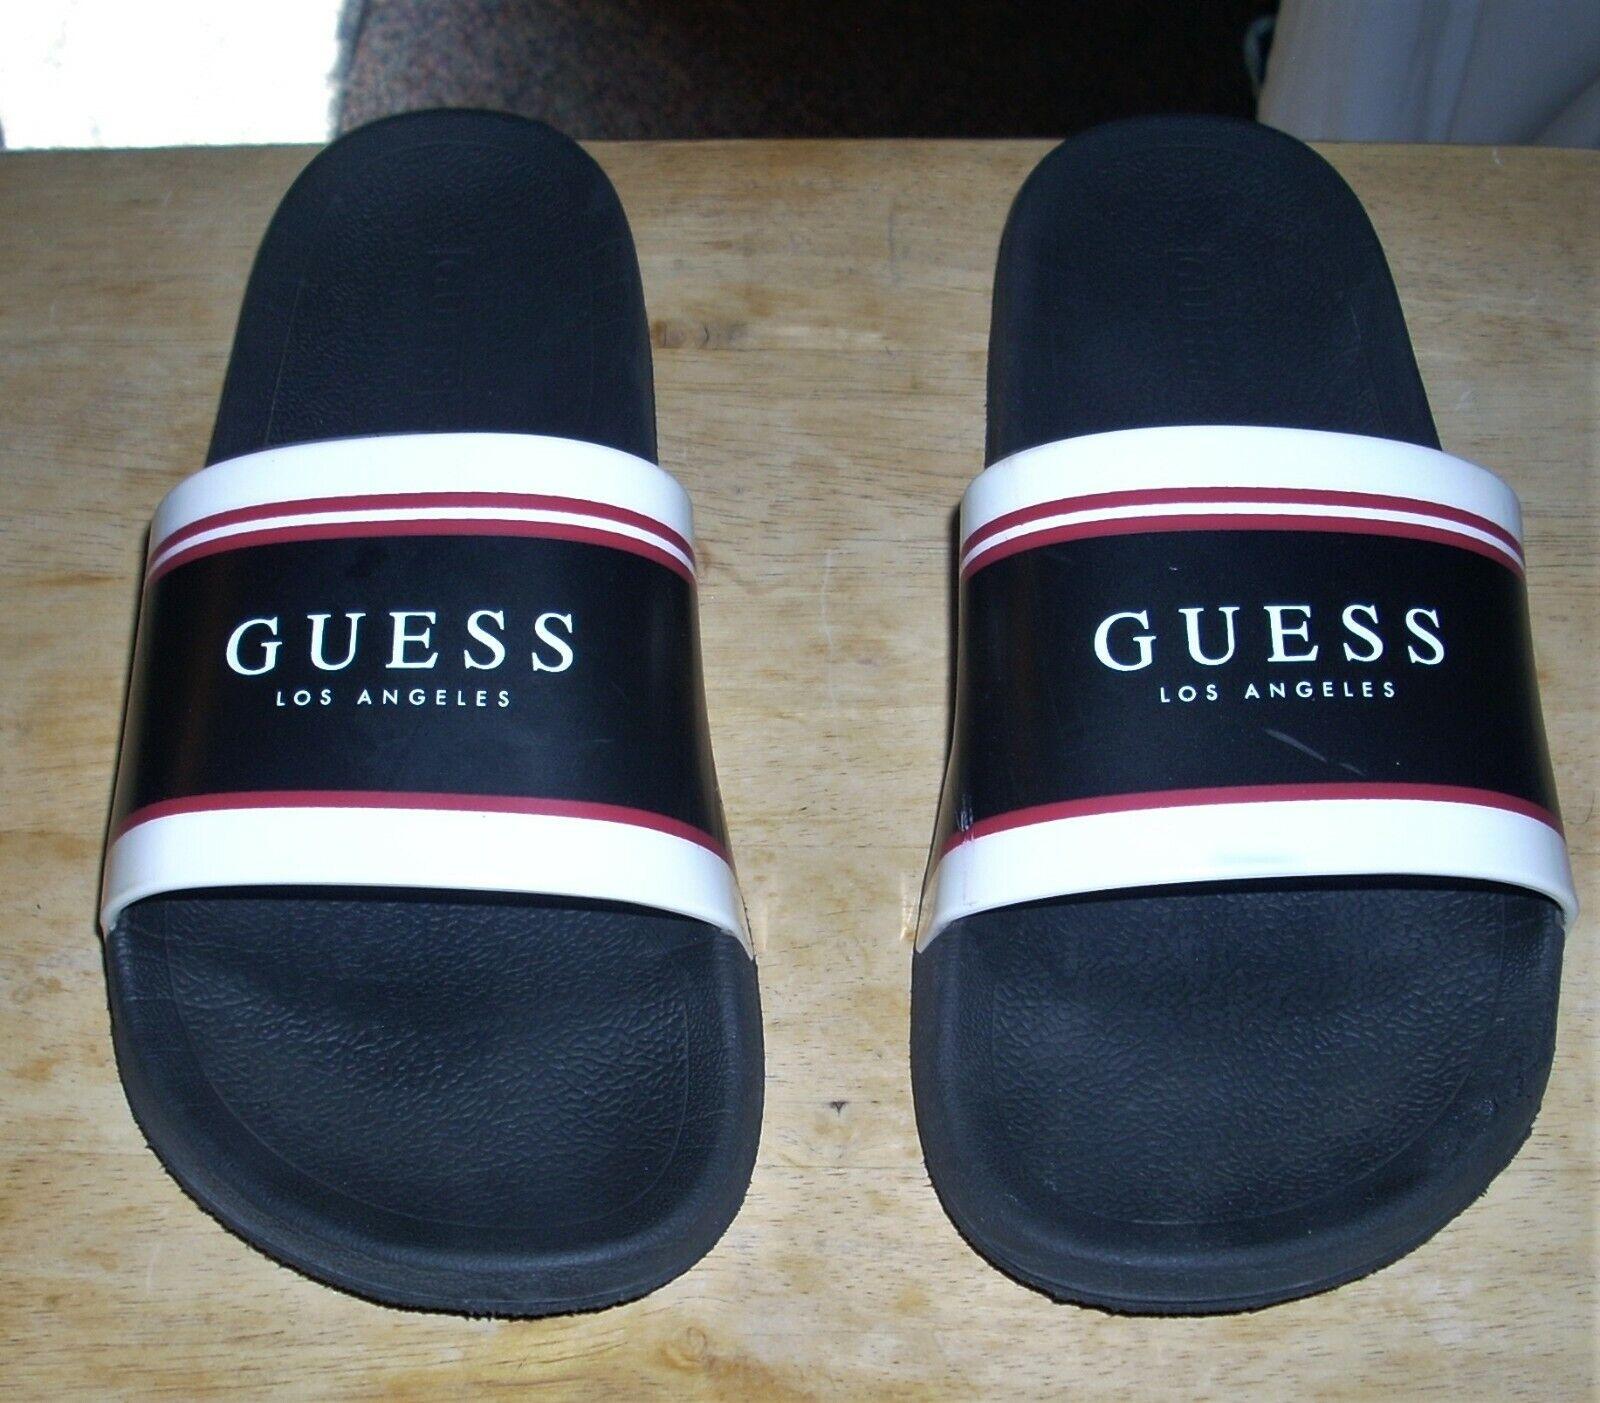 GUESS Los Angeles Black Slip On Slides Sandals GMExter Men's Size 13